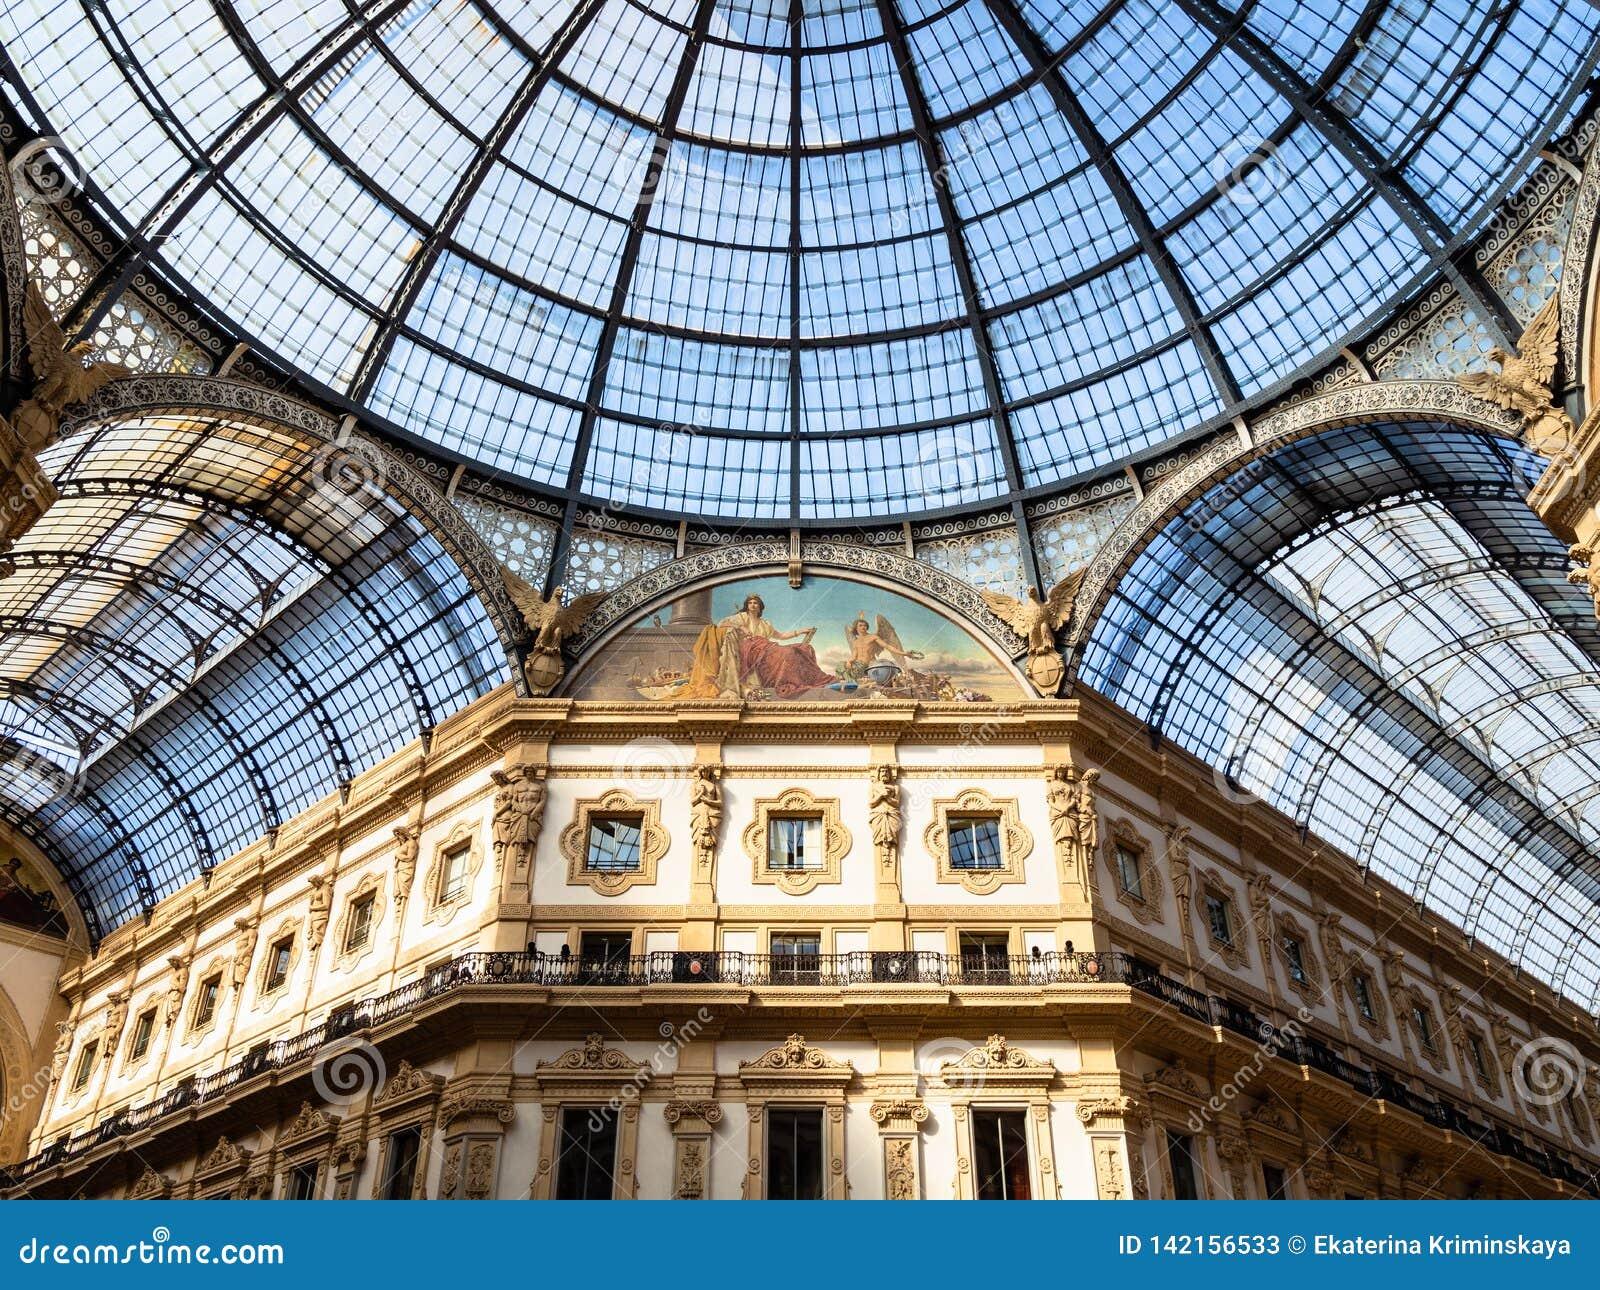 Teto de vidro da galeria Vittorio Emanuele II